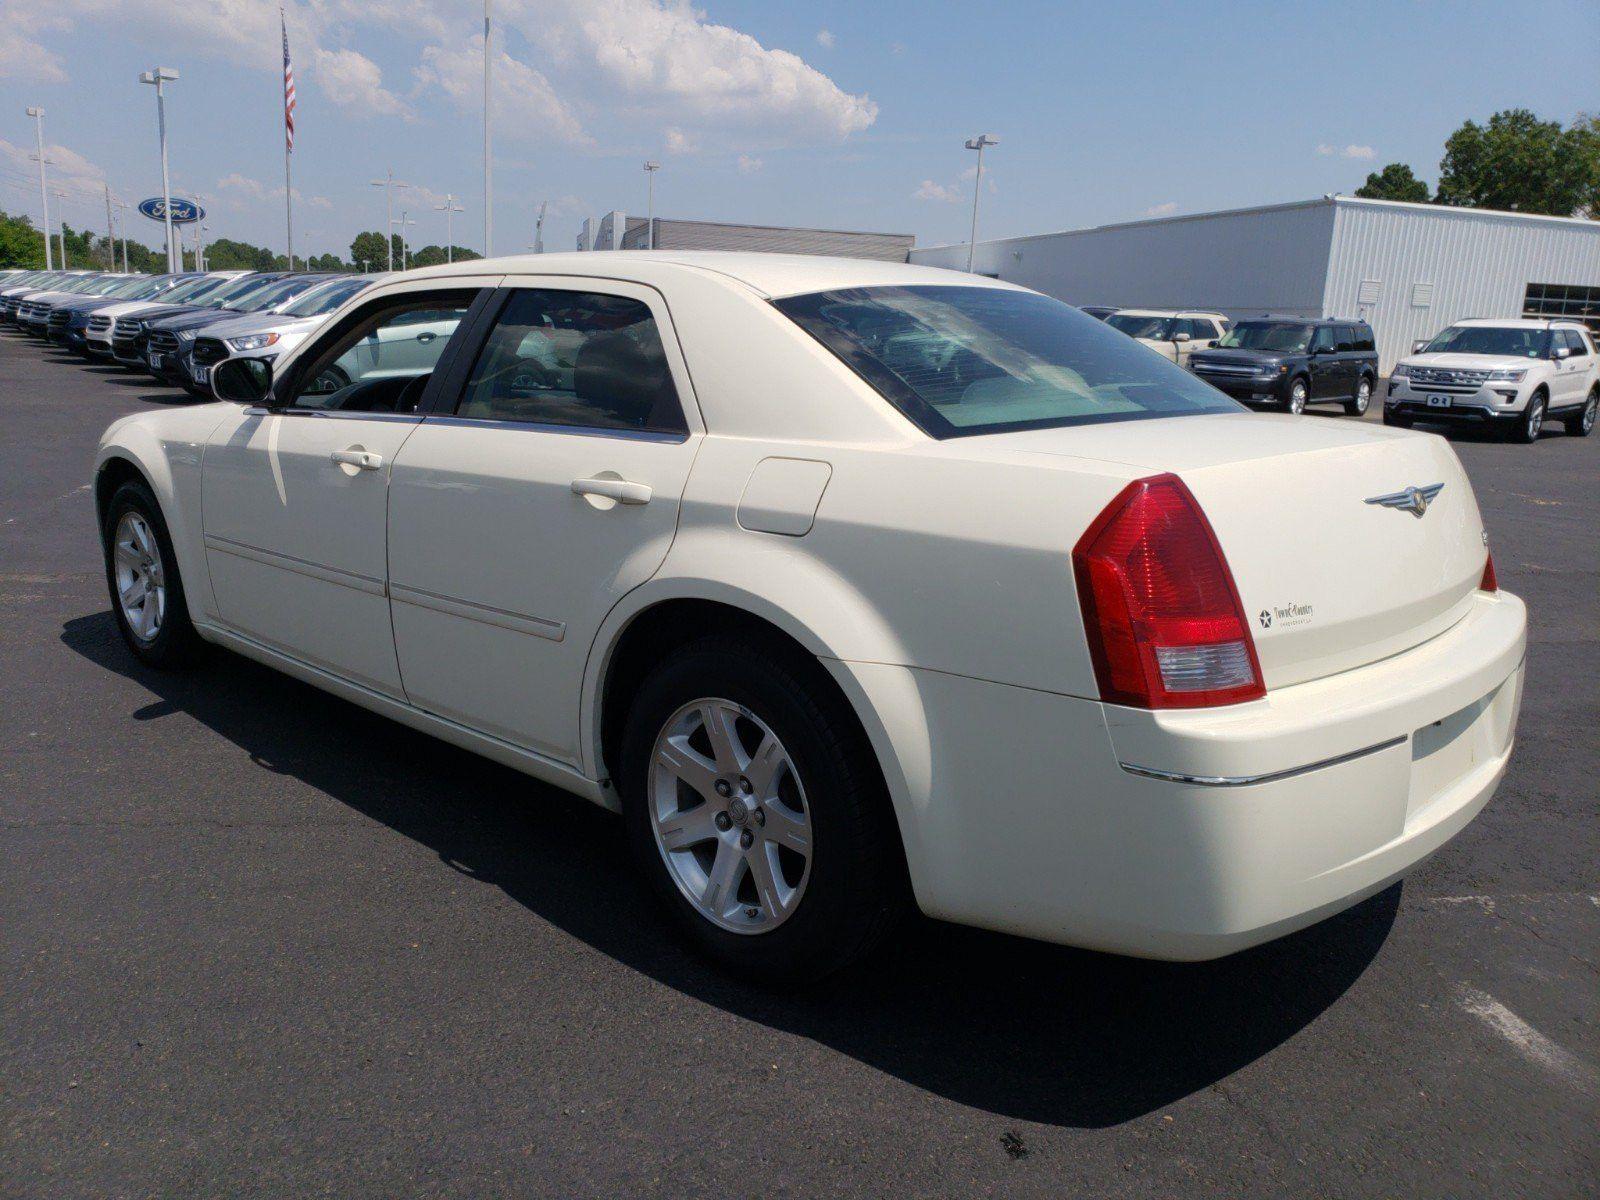 Elegant Cars For Sale Near Me Under 3000 Craigslist Cars For Sale